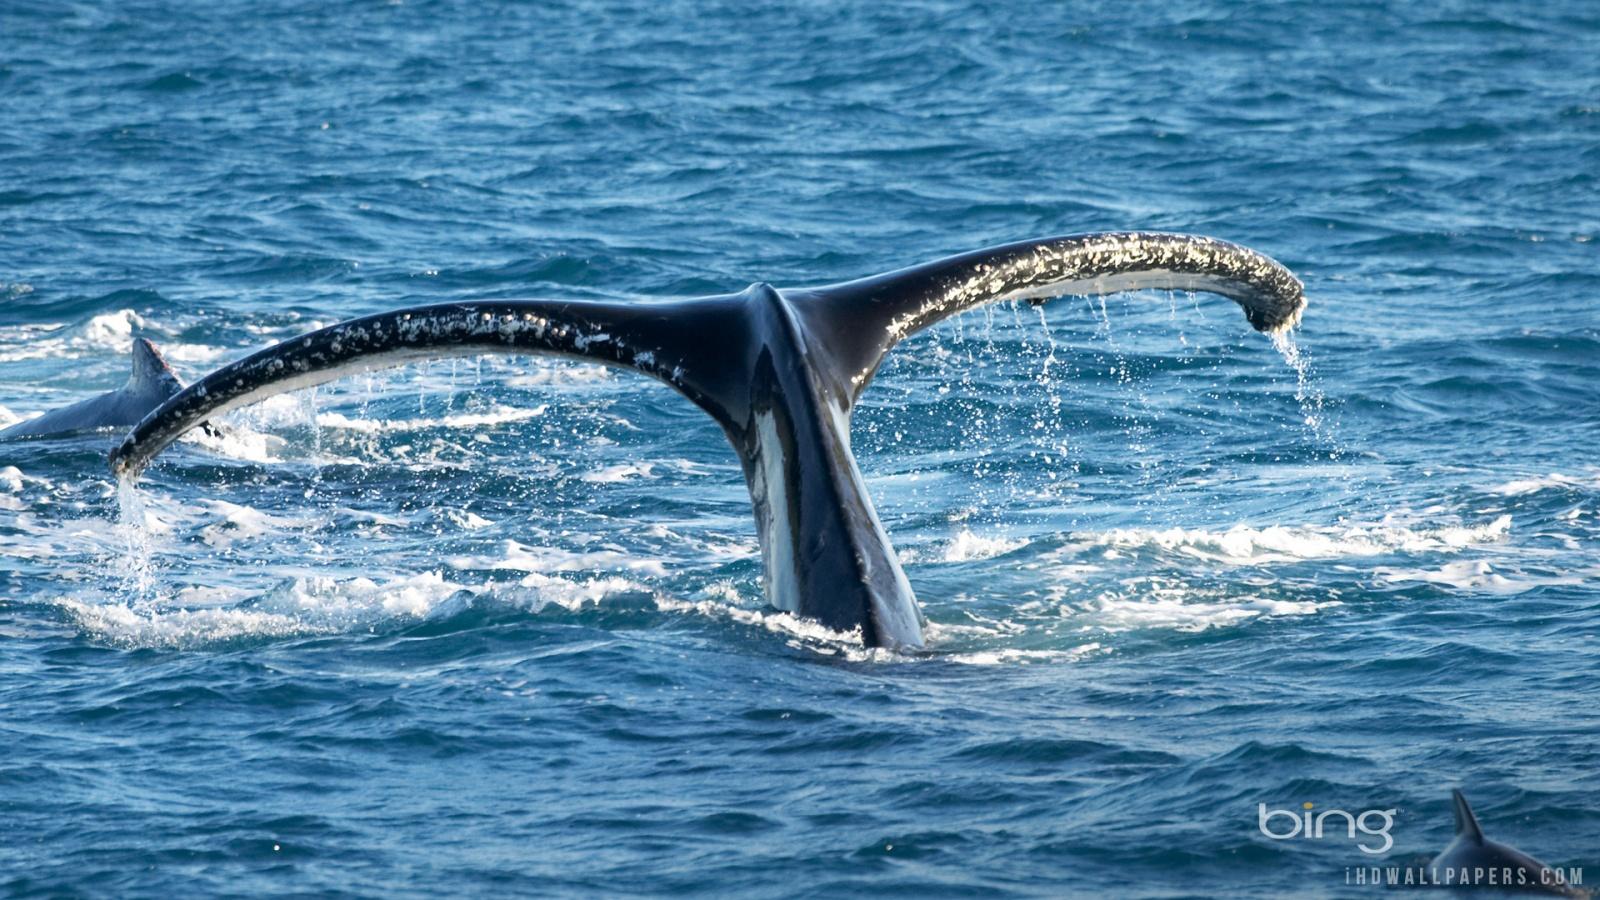 Humpback whale Wallpaper 1600x900